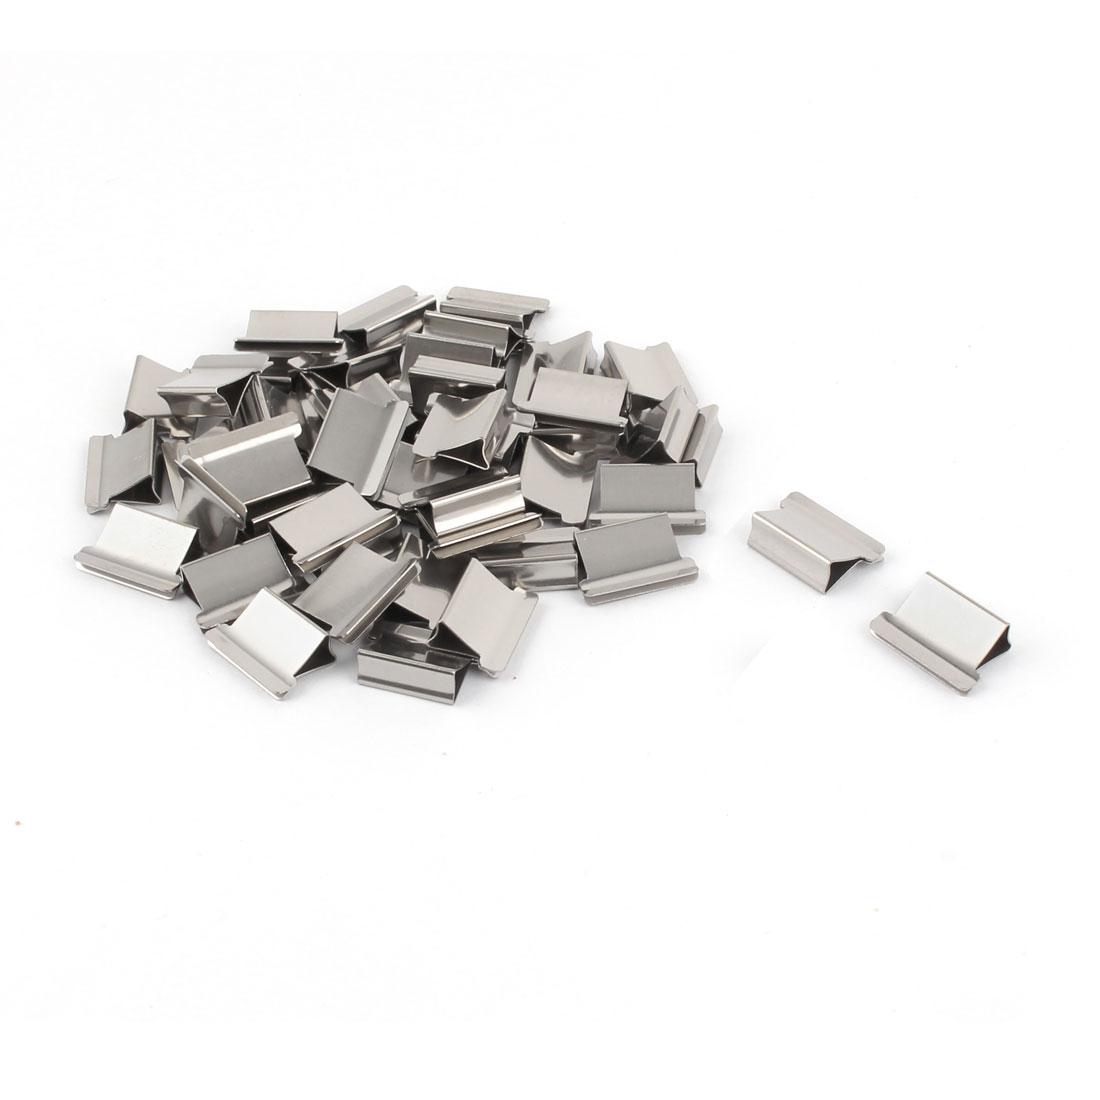 School Stationery Reusable Fast Clam Clip Dispenser Refills Silver Tone 50pcs